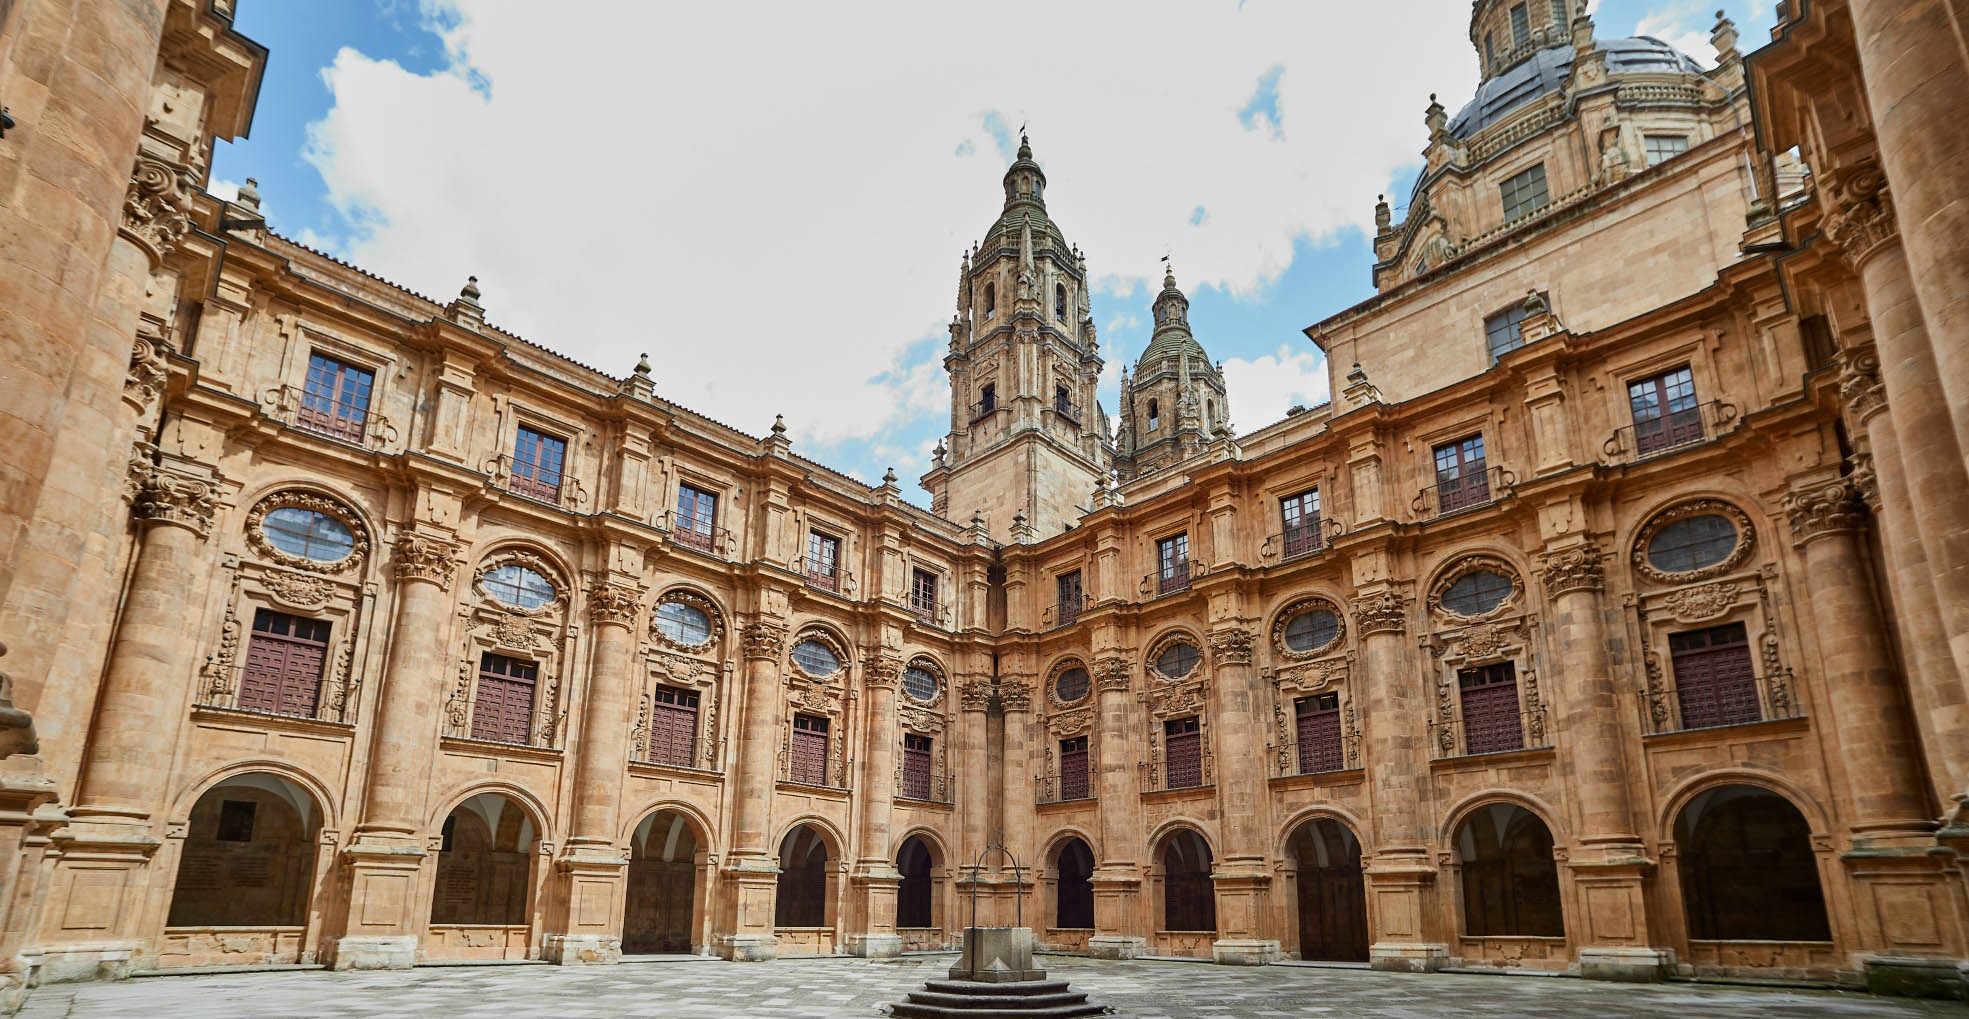 Universidad Pontificia de Salamanca - UPSA